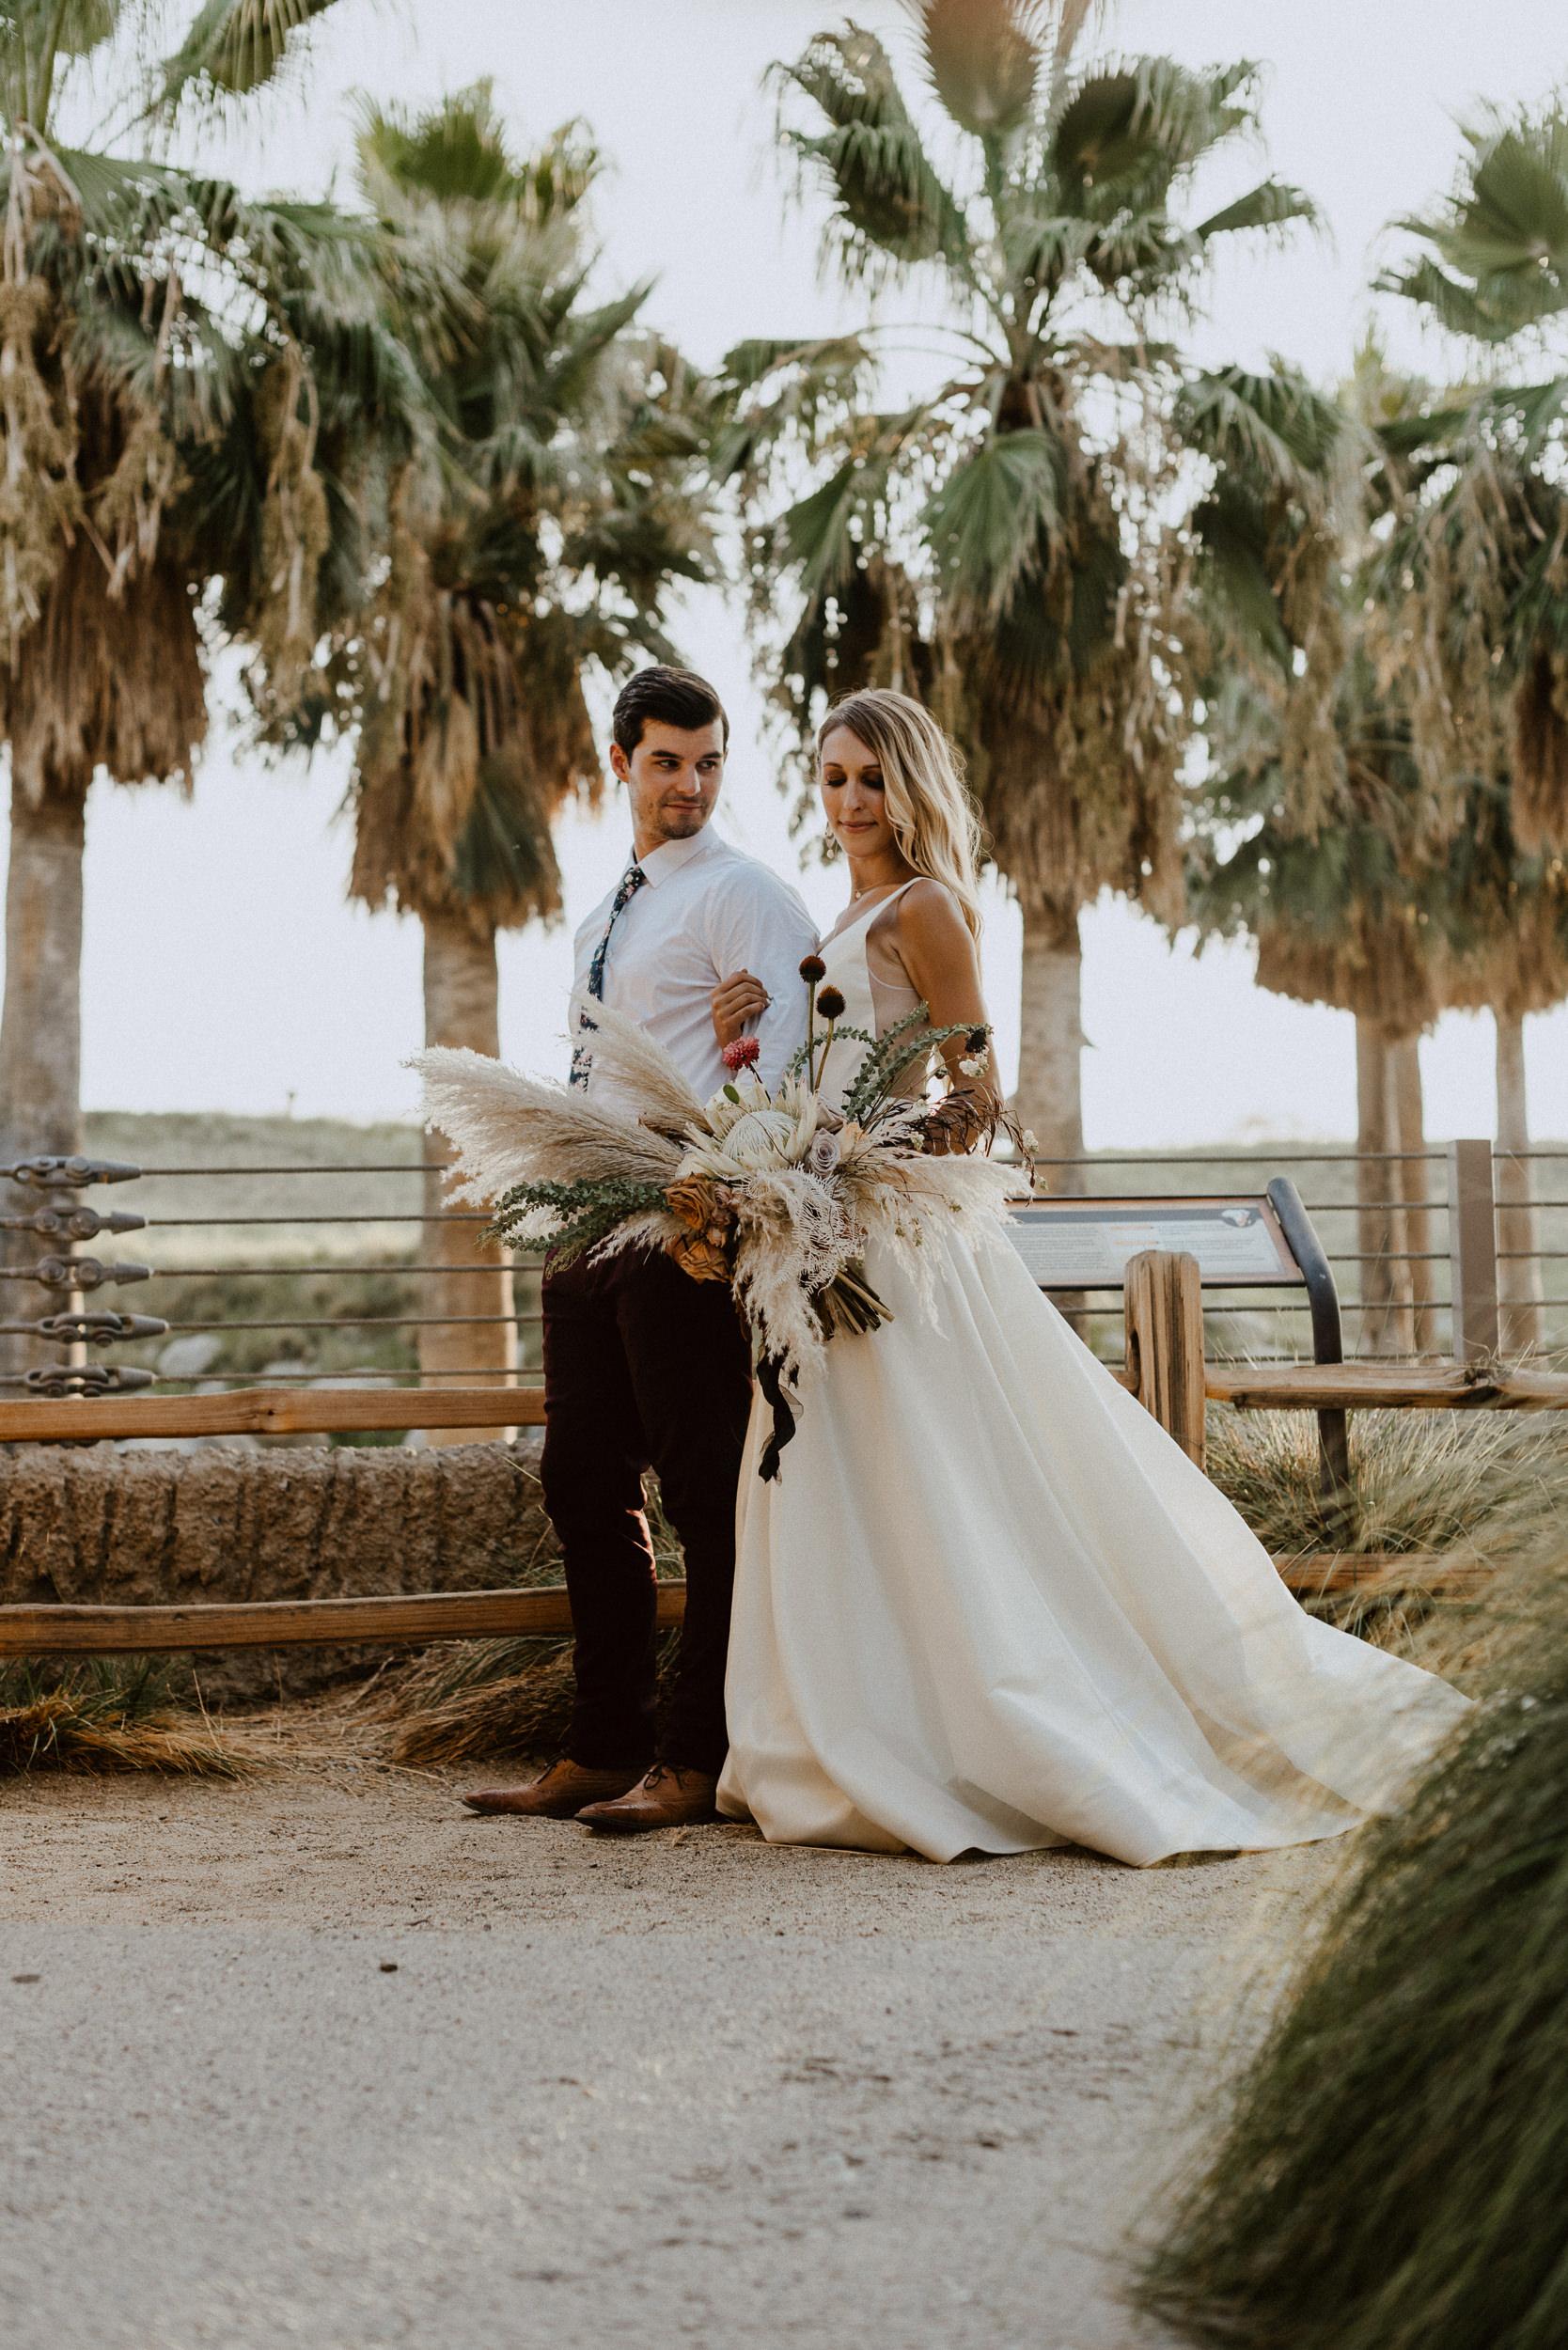 sChelsie + Chris - The Desert Shootout Wedding Romantics at The Living Desert-128.jpg